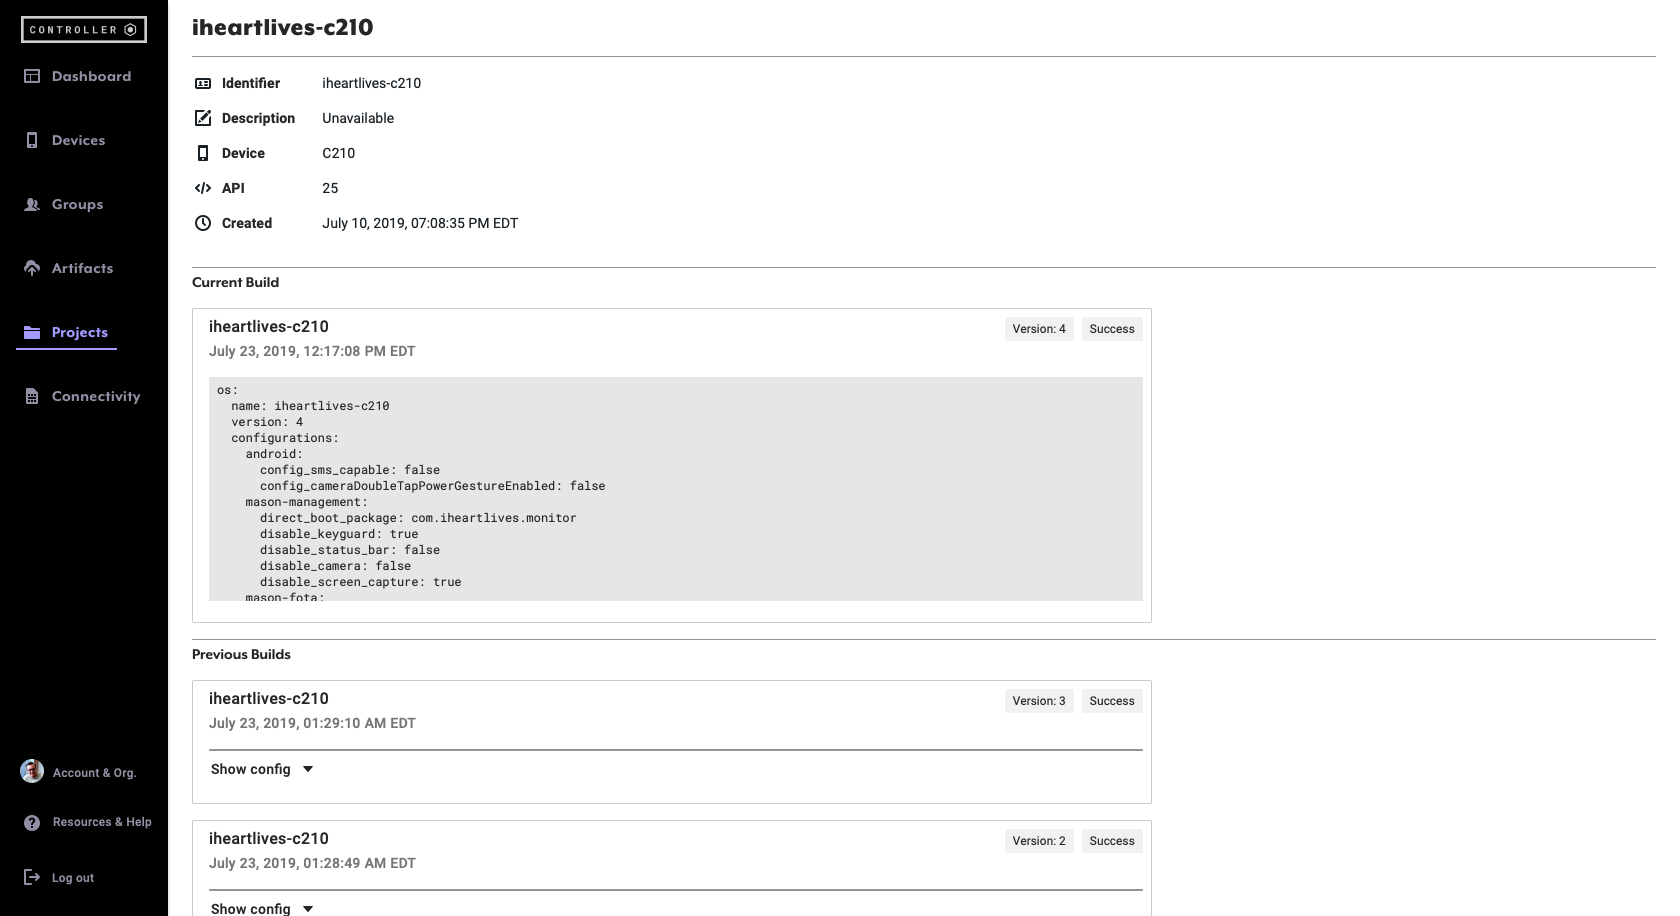 Controller builds for iheartlives-c210